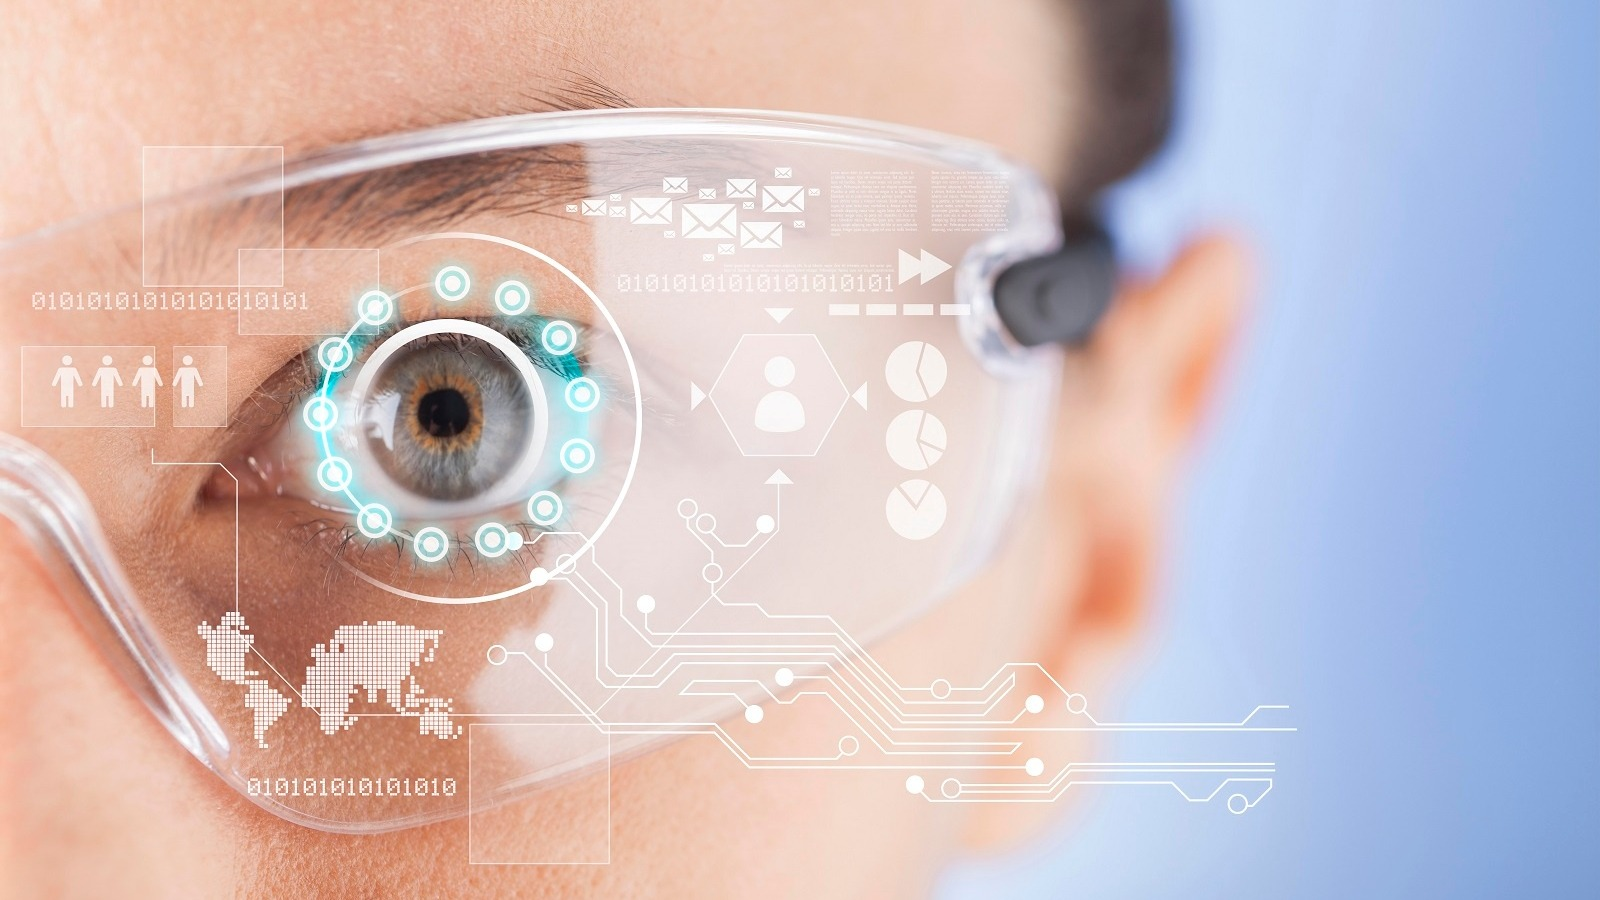 Futuristic-smart-glasses.jpg